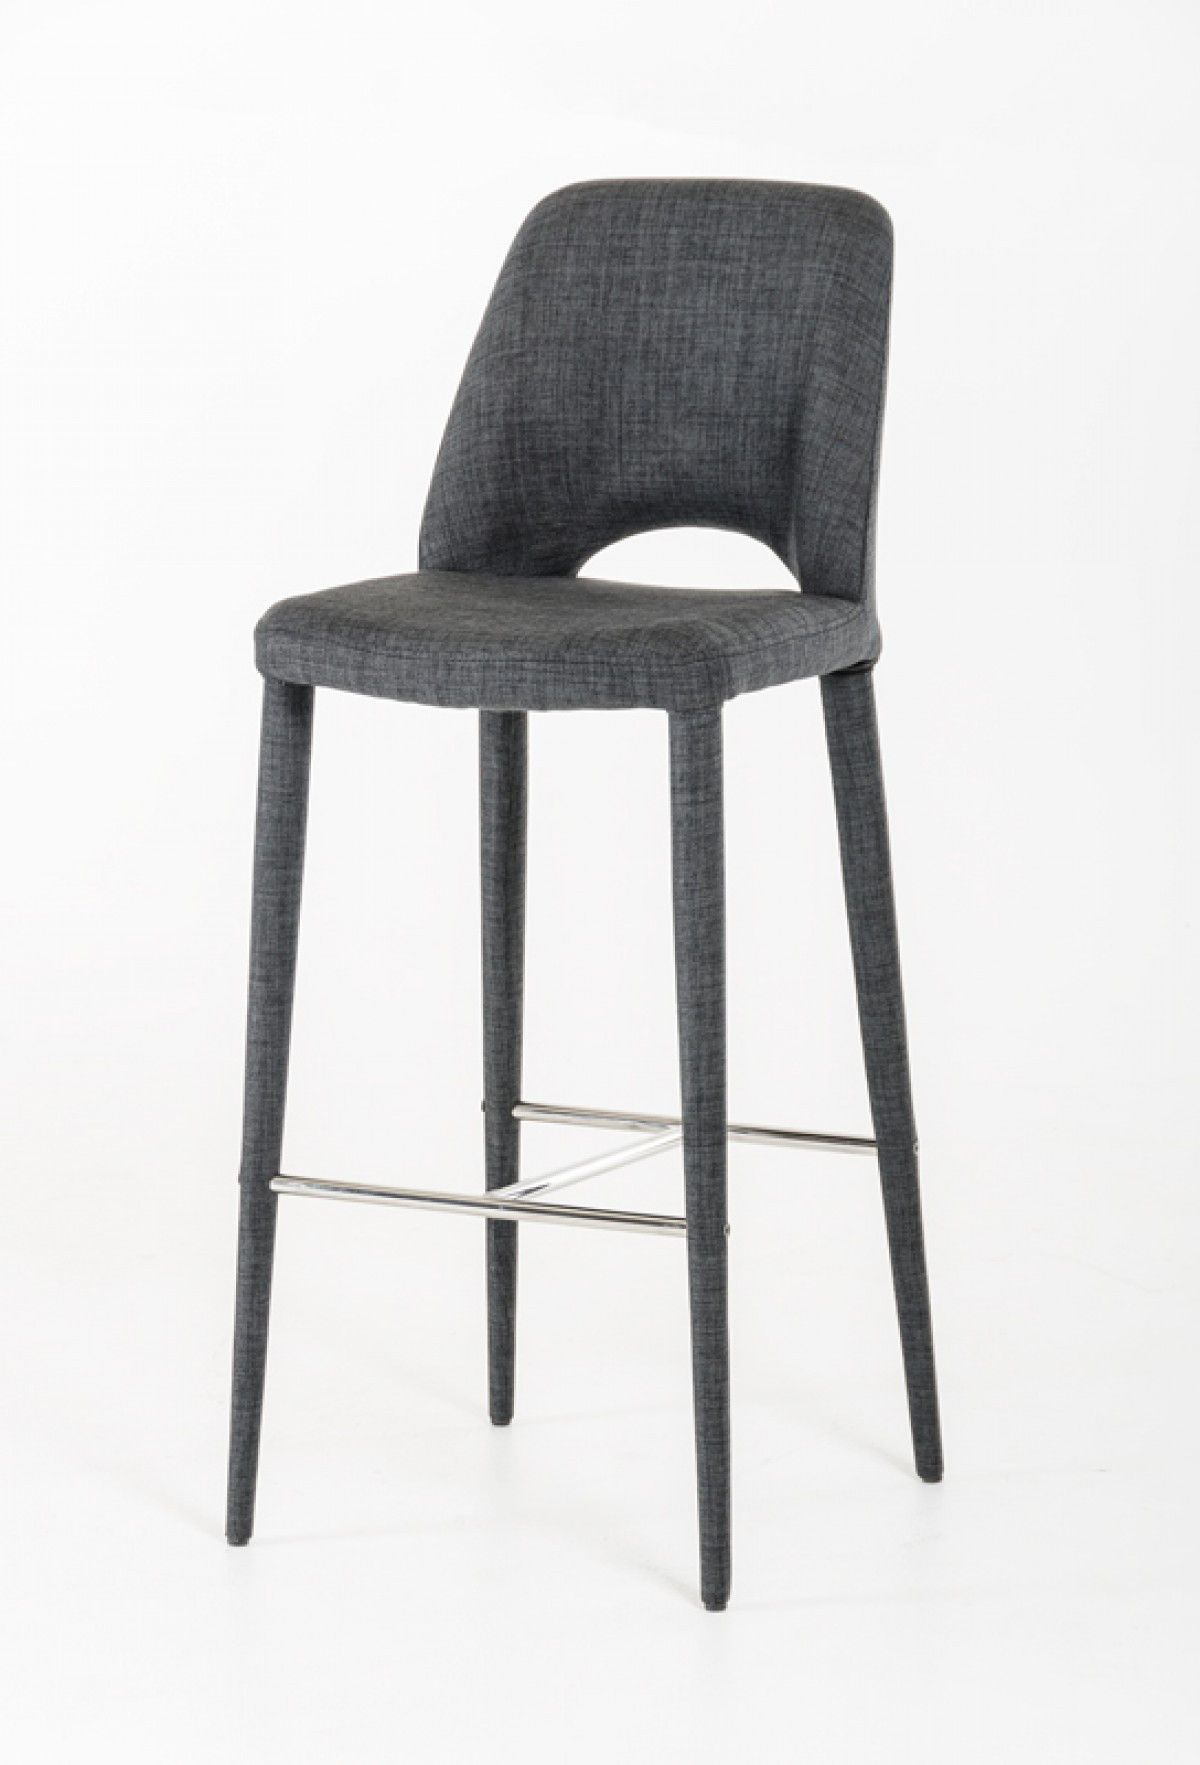 Modern Dark Grey Fabric Bar Stool Modrest Williamette Vgeumc 8980ch B Gry Fabric Bar Stool Bar Stools At Home Bar Stools